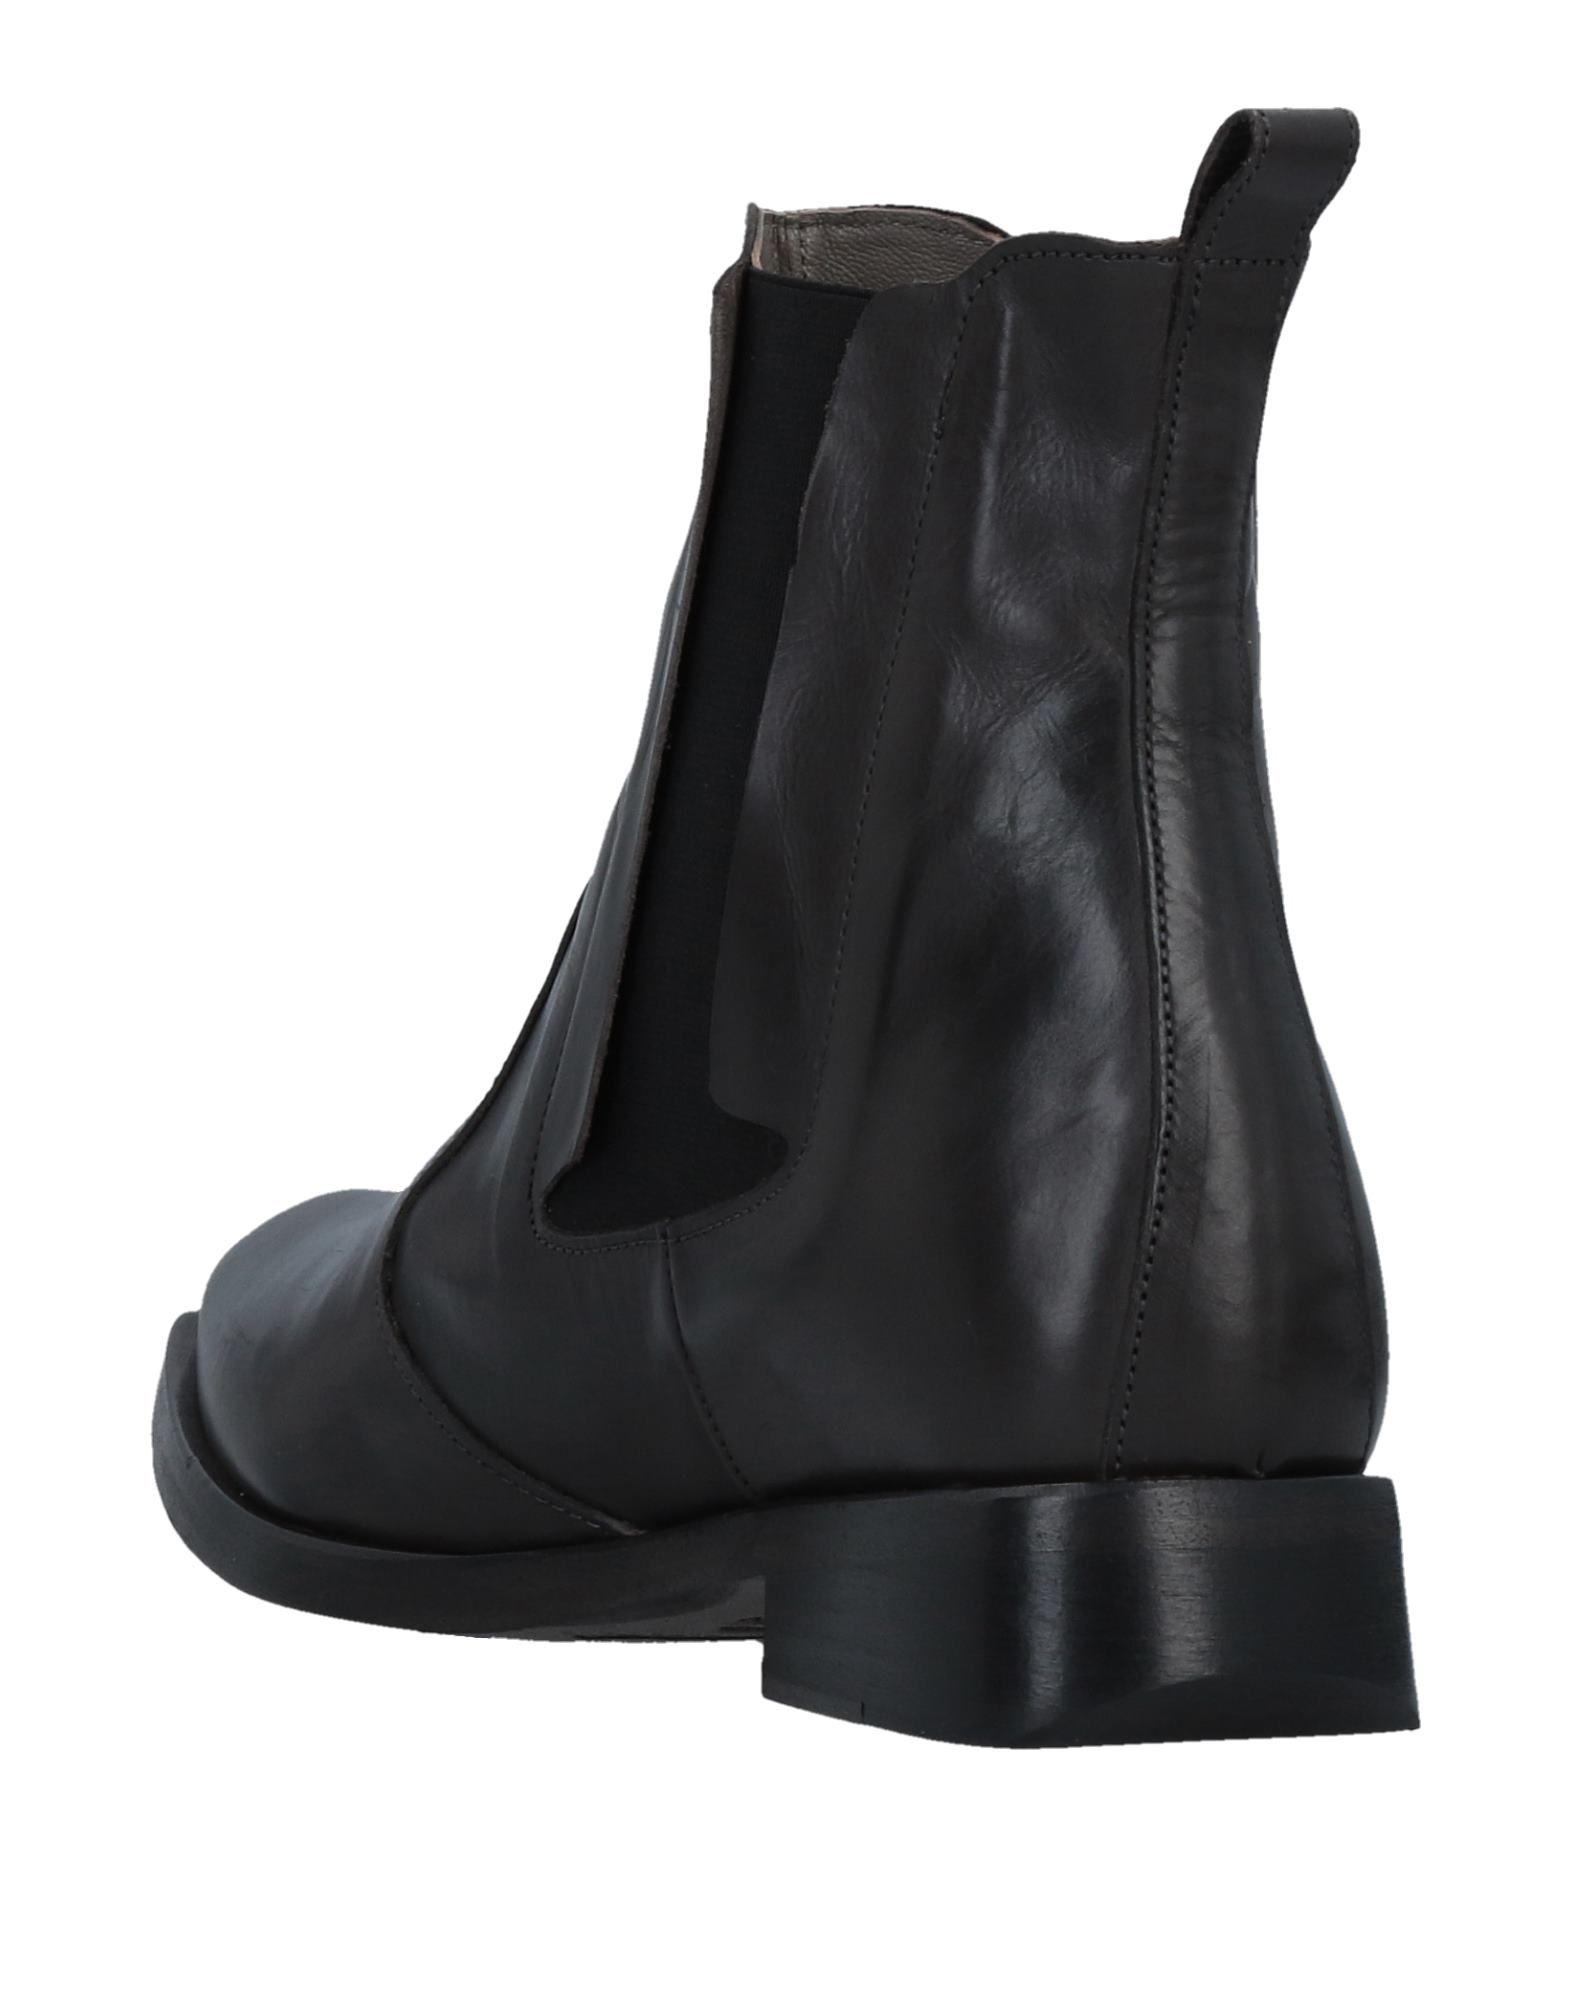 Ixos Stiefelette Damen   11507901JC Heiße Schuhe d4a740